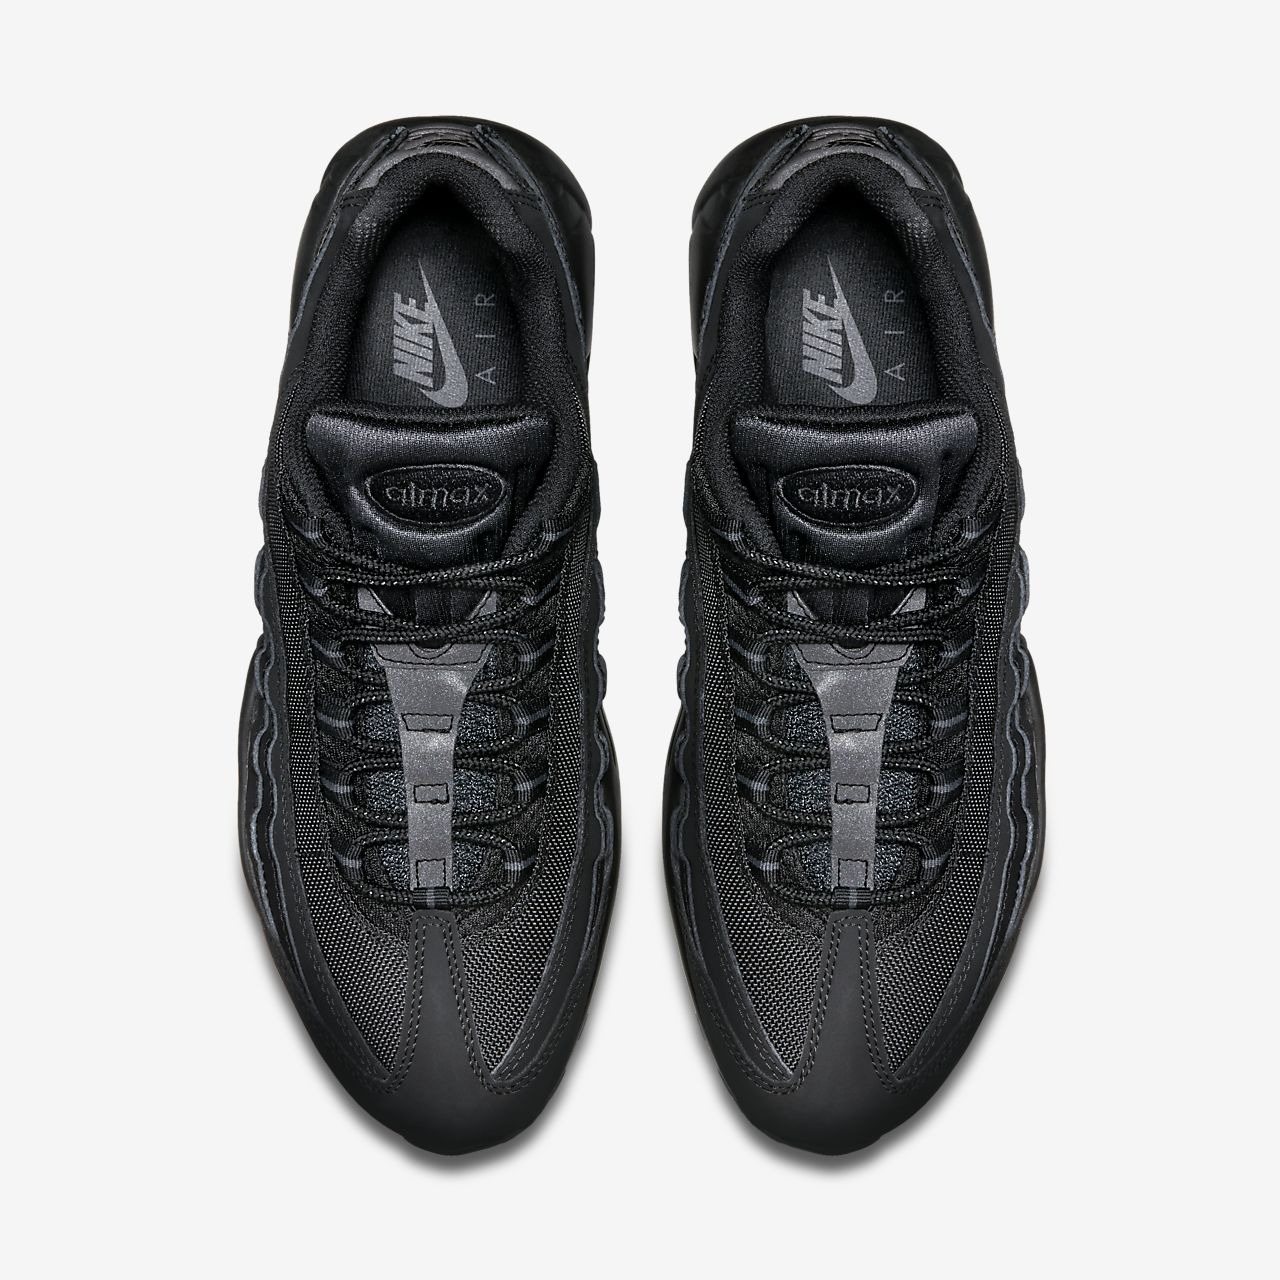 los angeles f3a70 5edda ... Nike Air Max 95 Men s Shoe